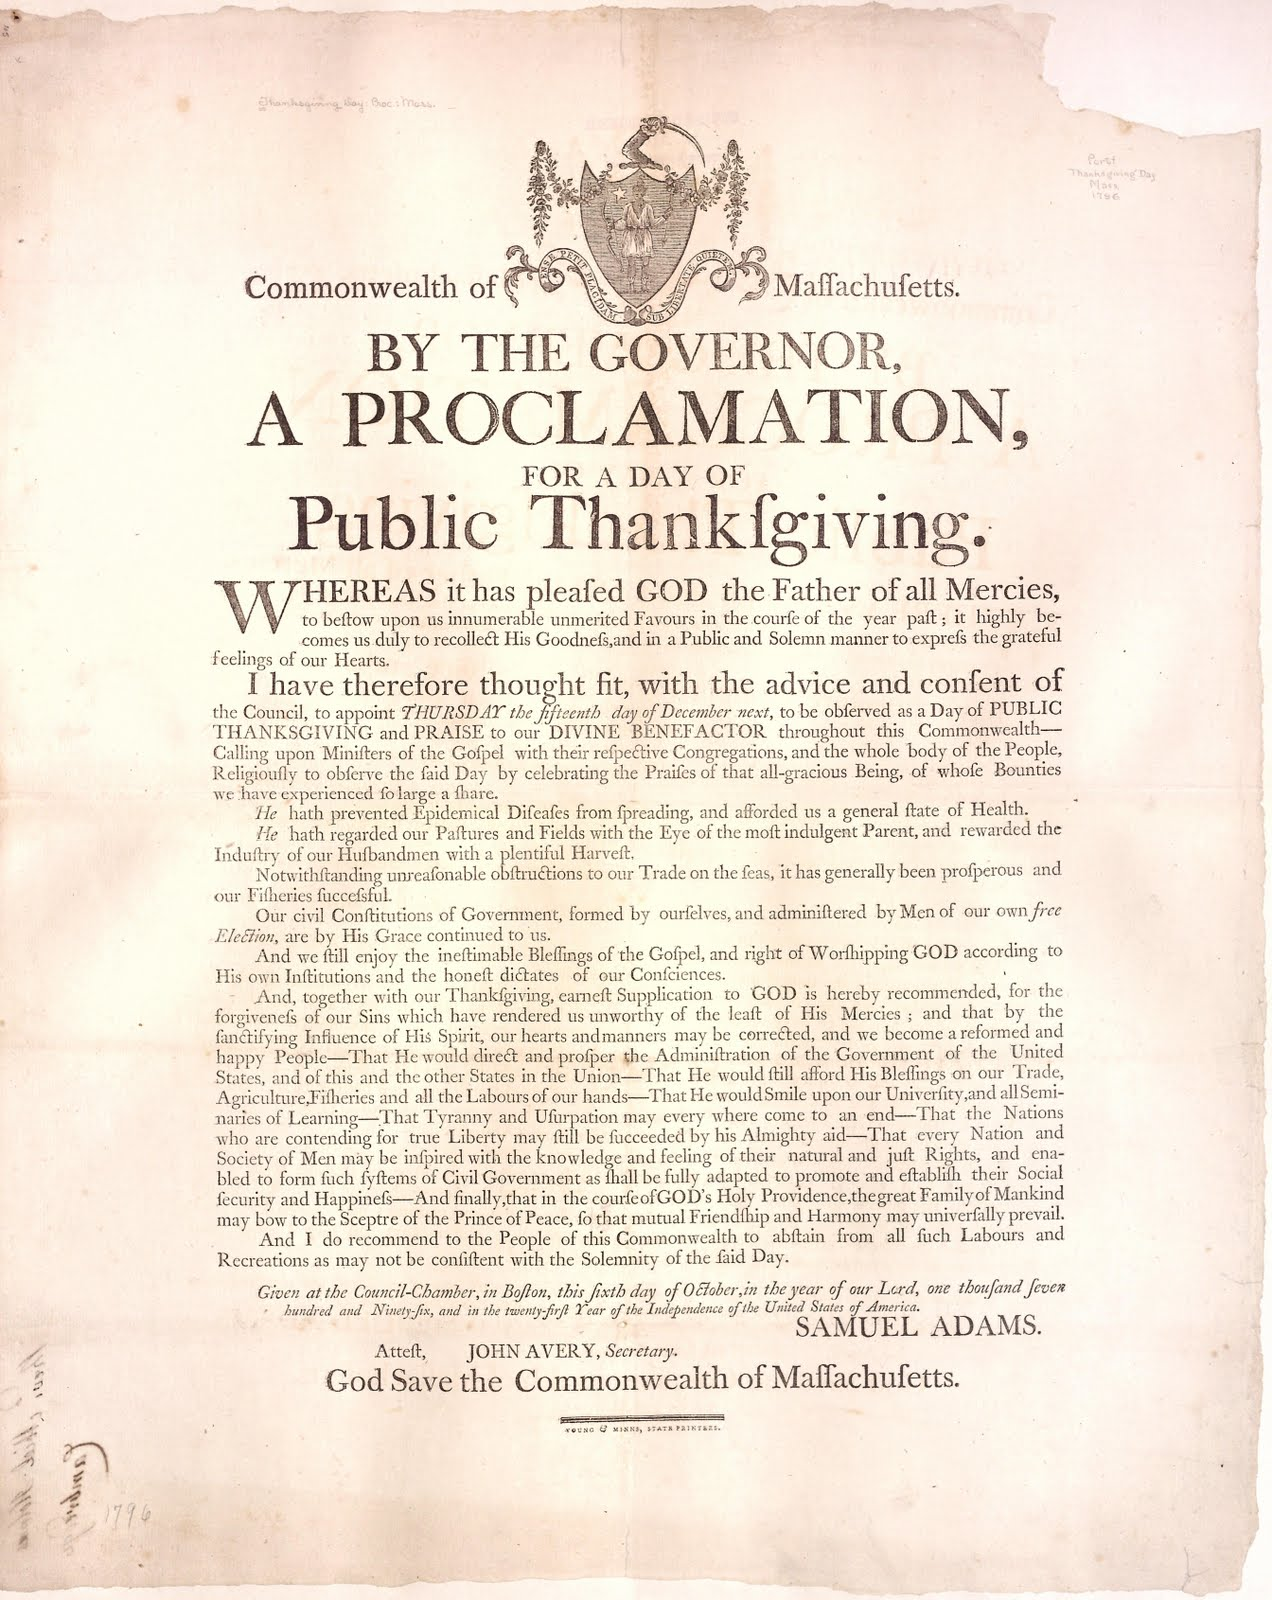 Thanksgiving Proclamation, Governor Samuel Adams, Massachusetts, 1796.